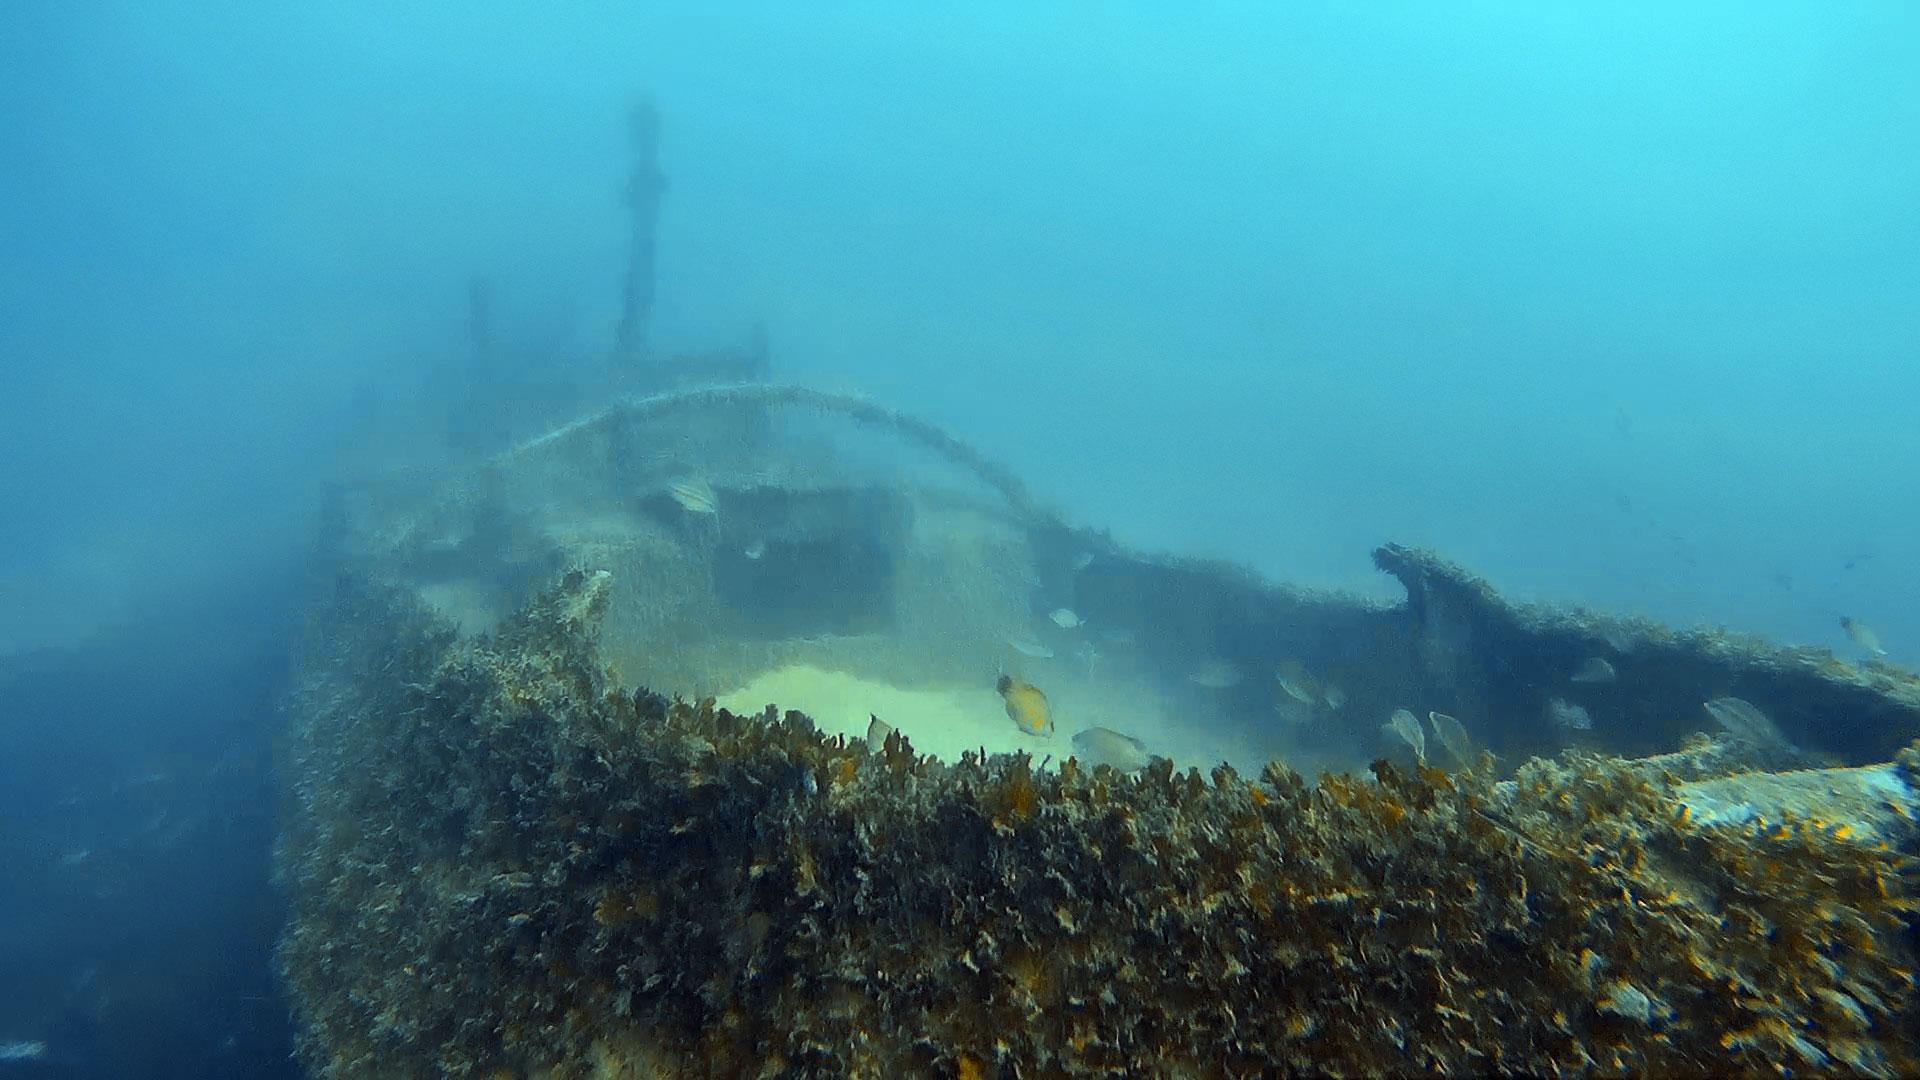 Tugboat 10 wreck in Marsaskala